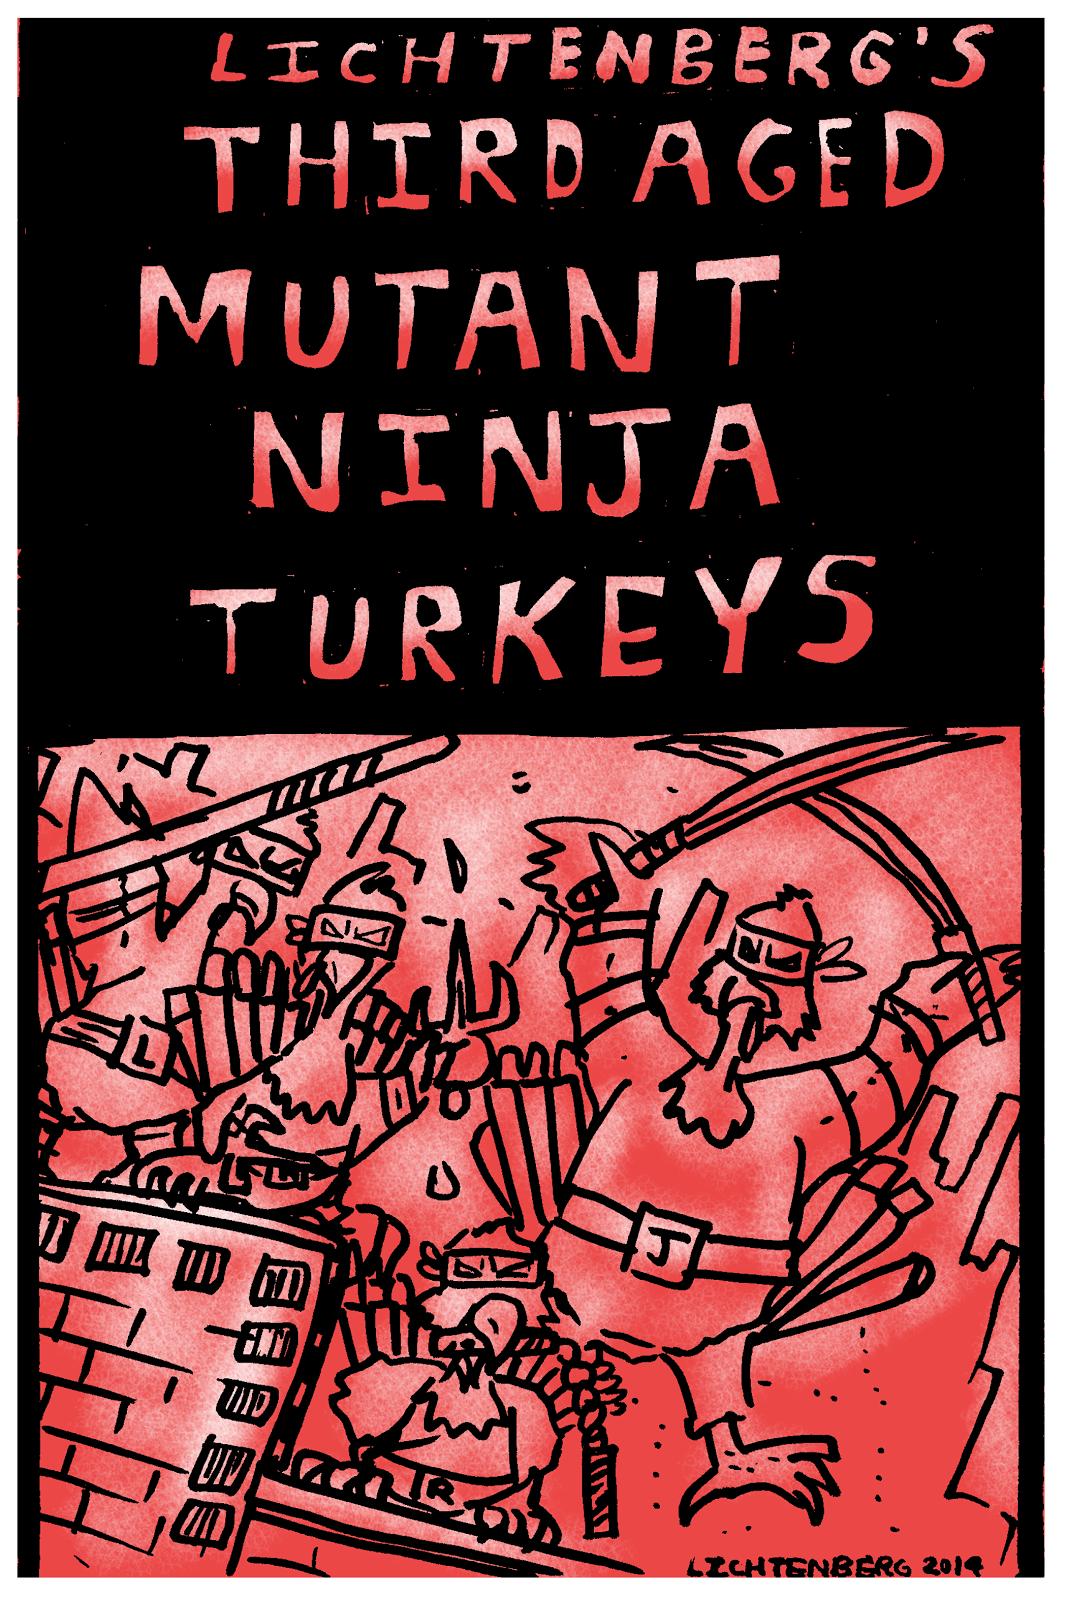 The Third Aged Mutant Ninja Turkeys